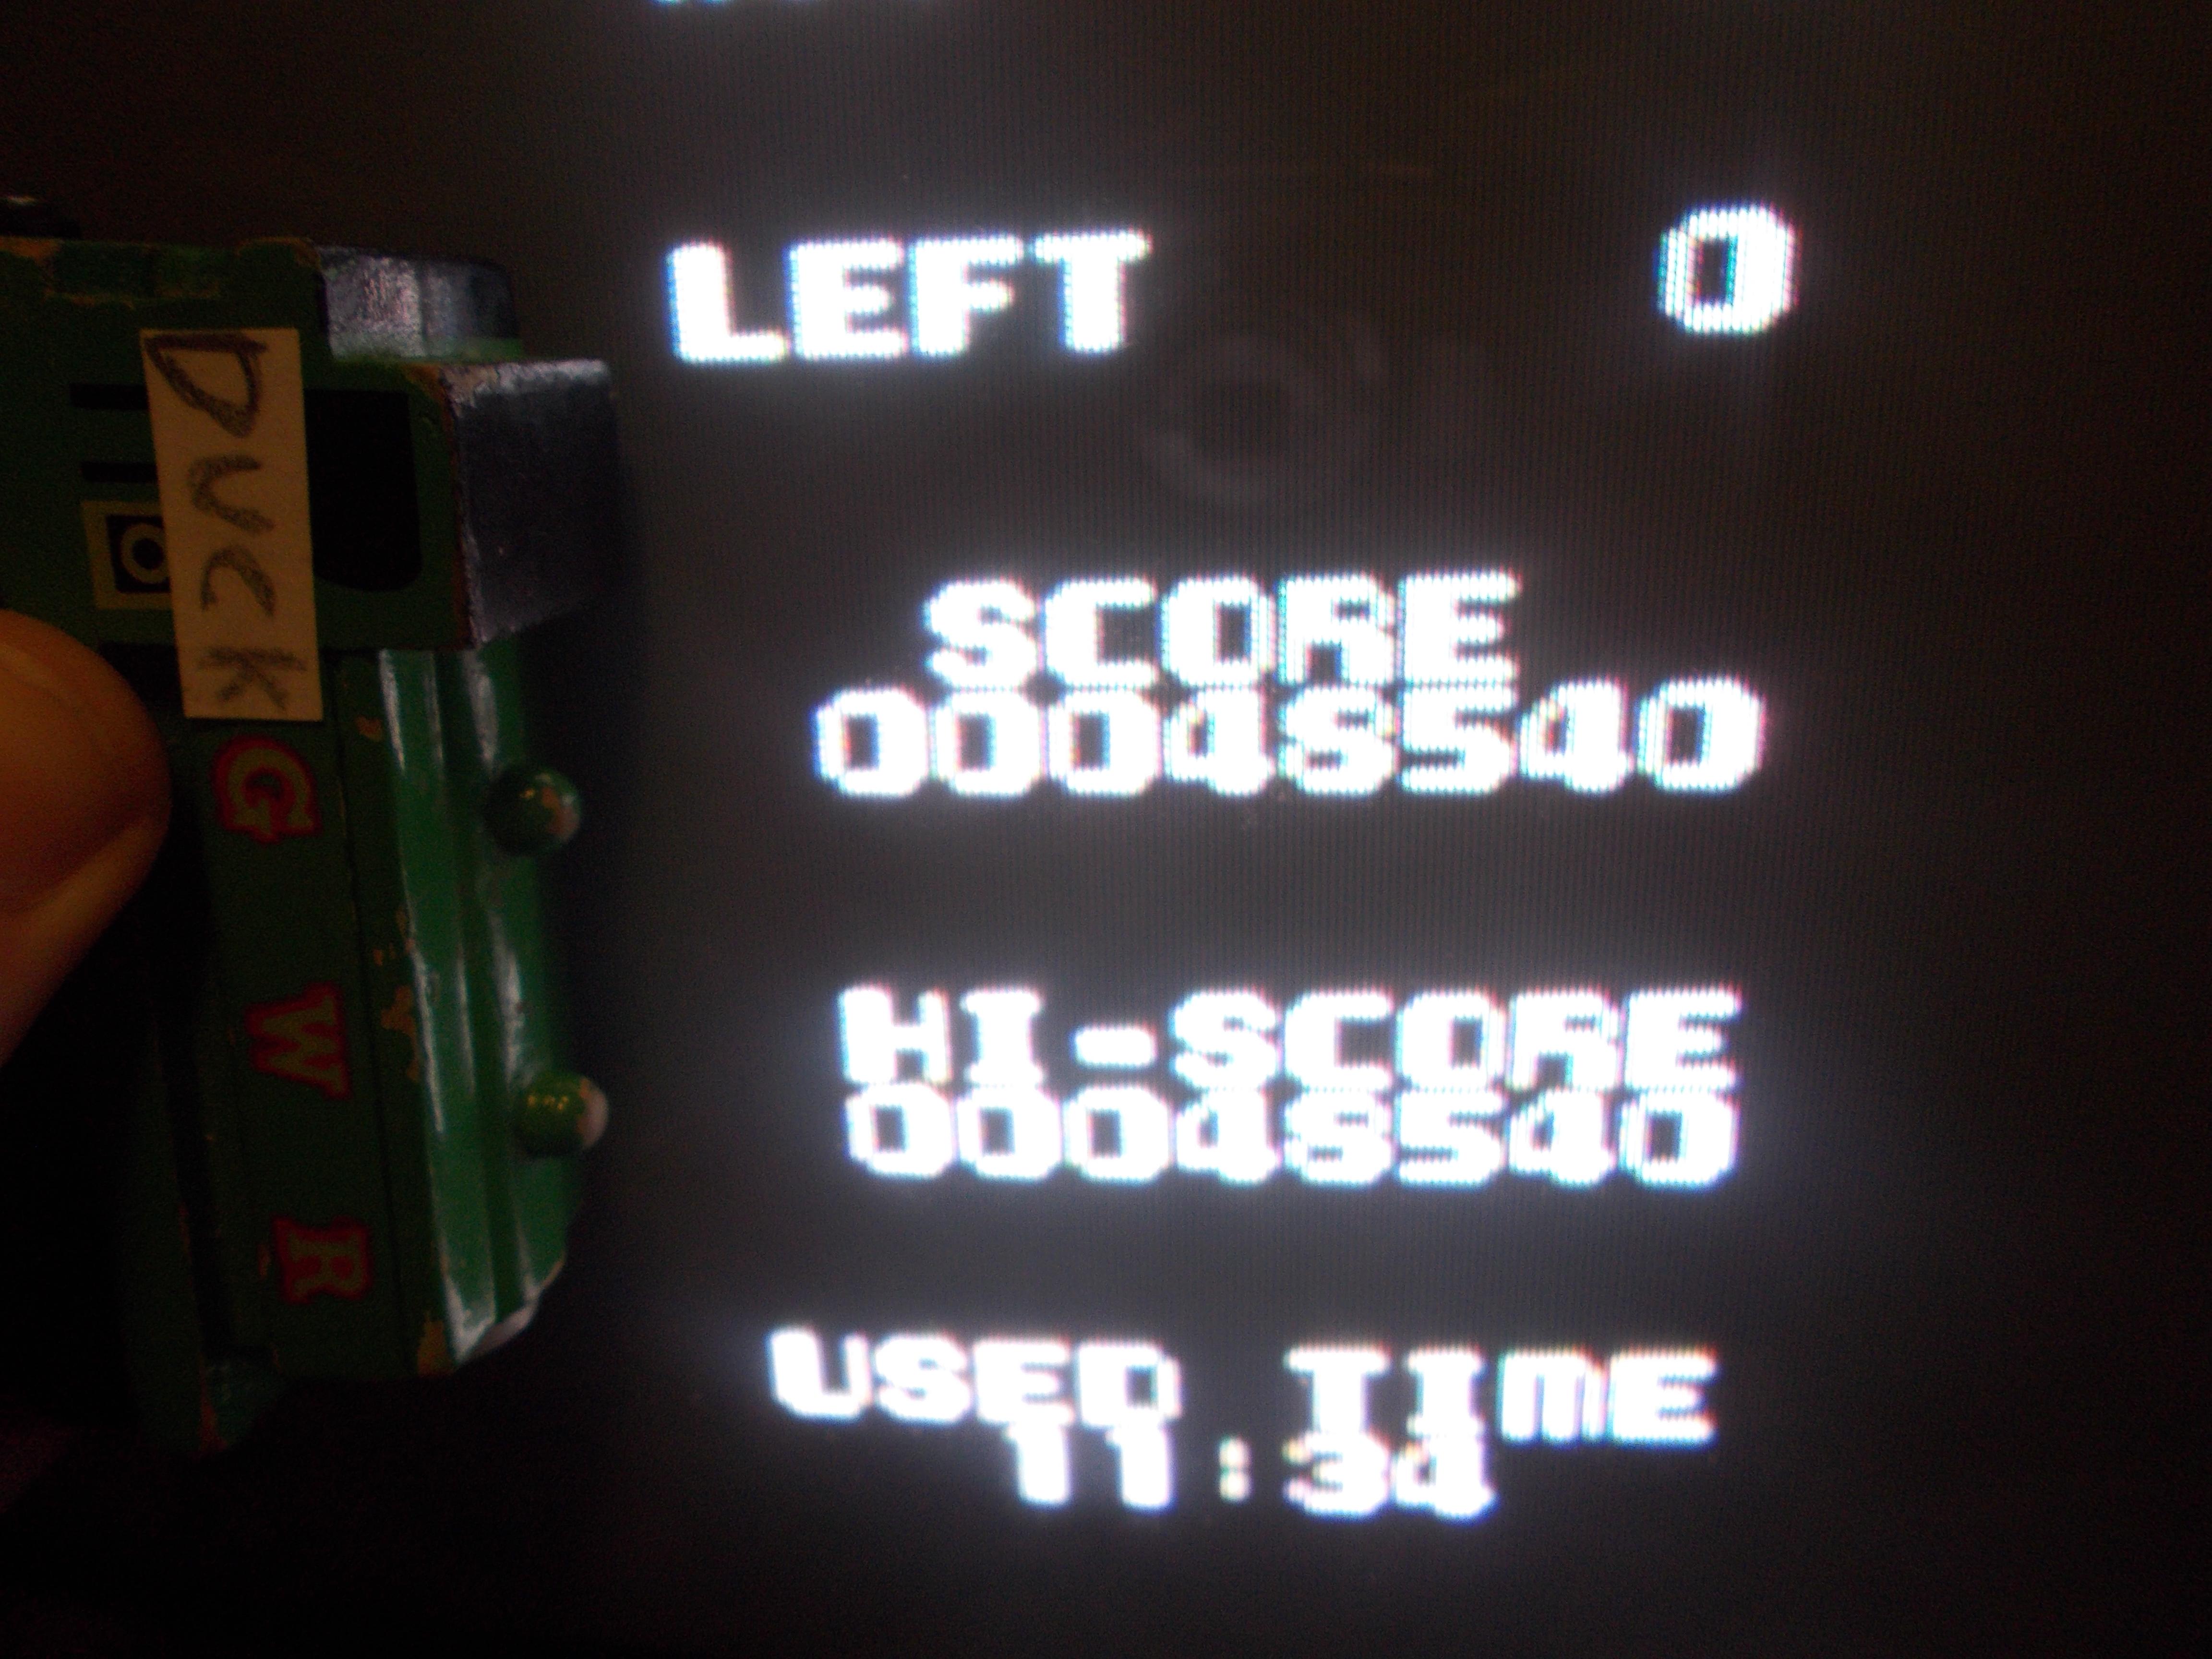 DuckGWR: Dough Boy (NES/Famicom) 48,540 points on 2014-11-19 21:10:19